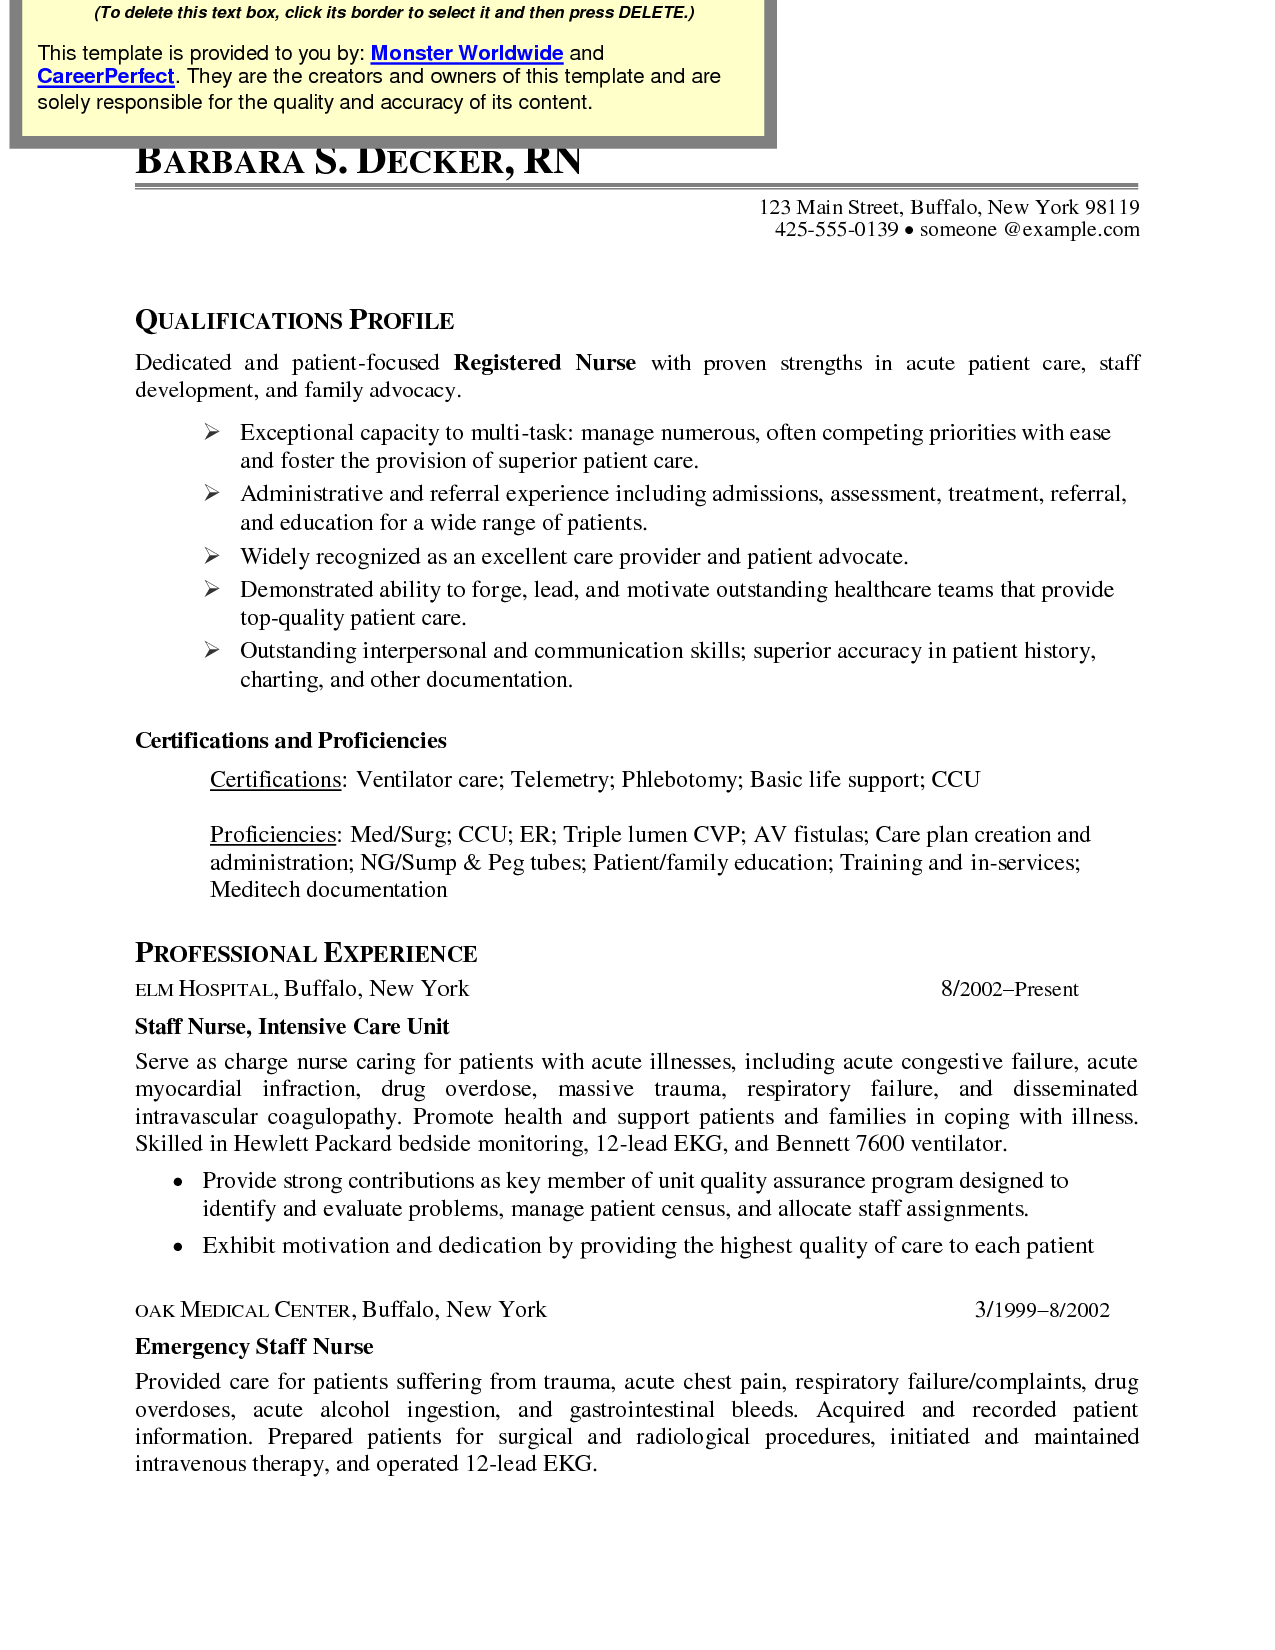 icu nurse sample resume objective